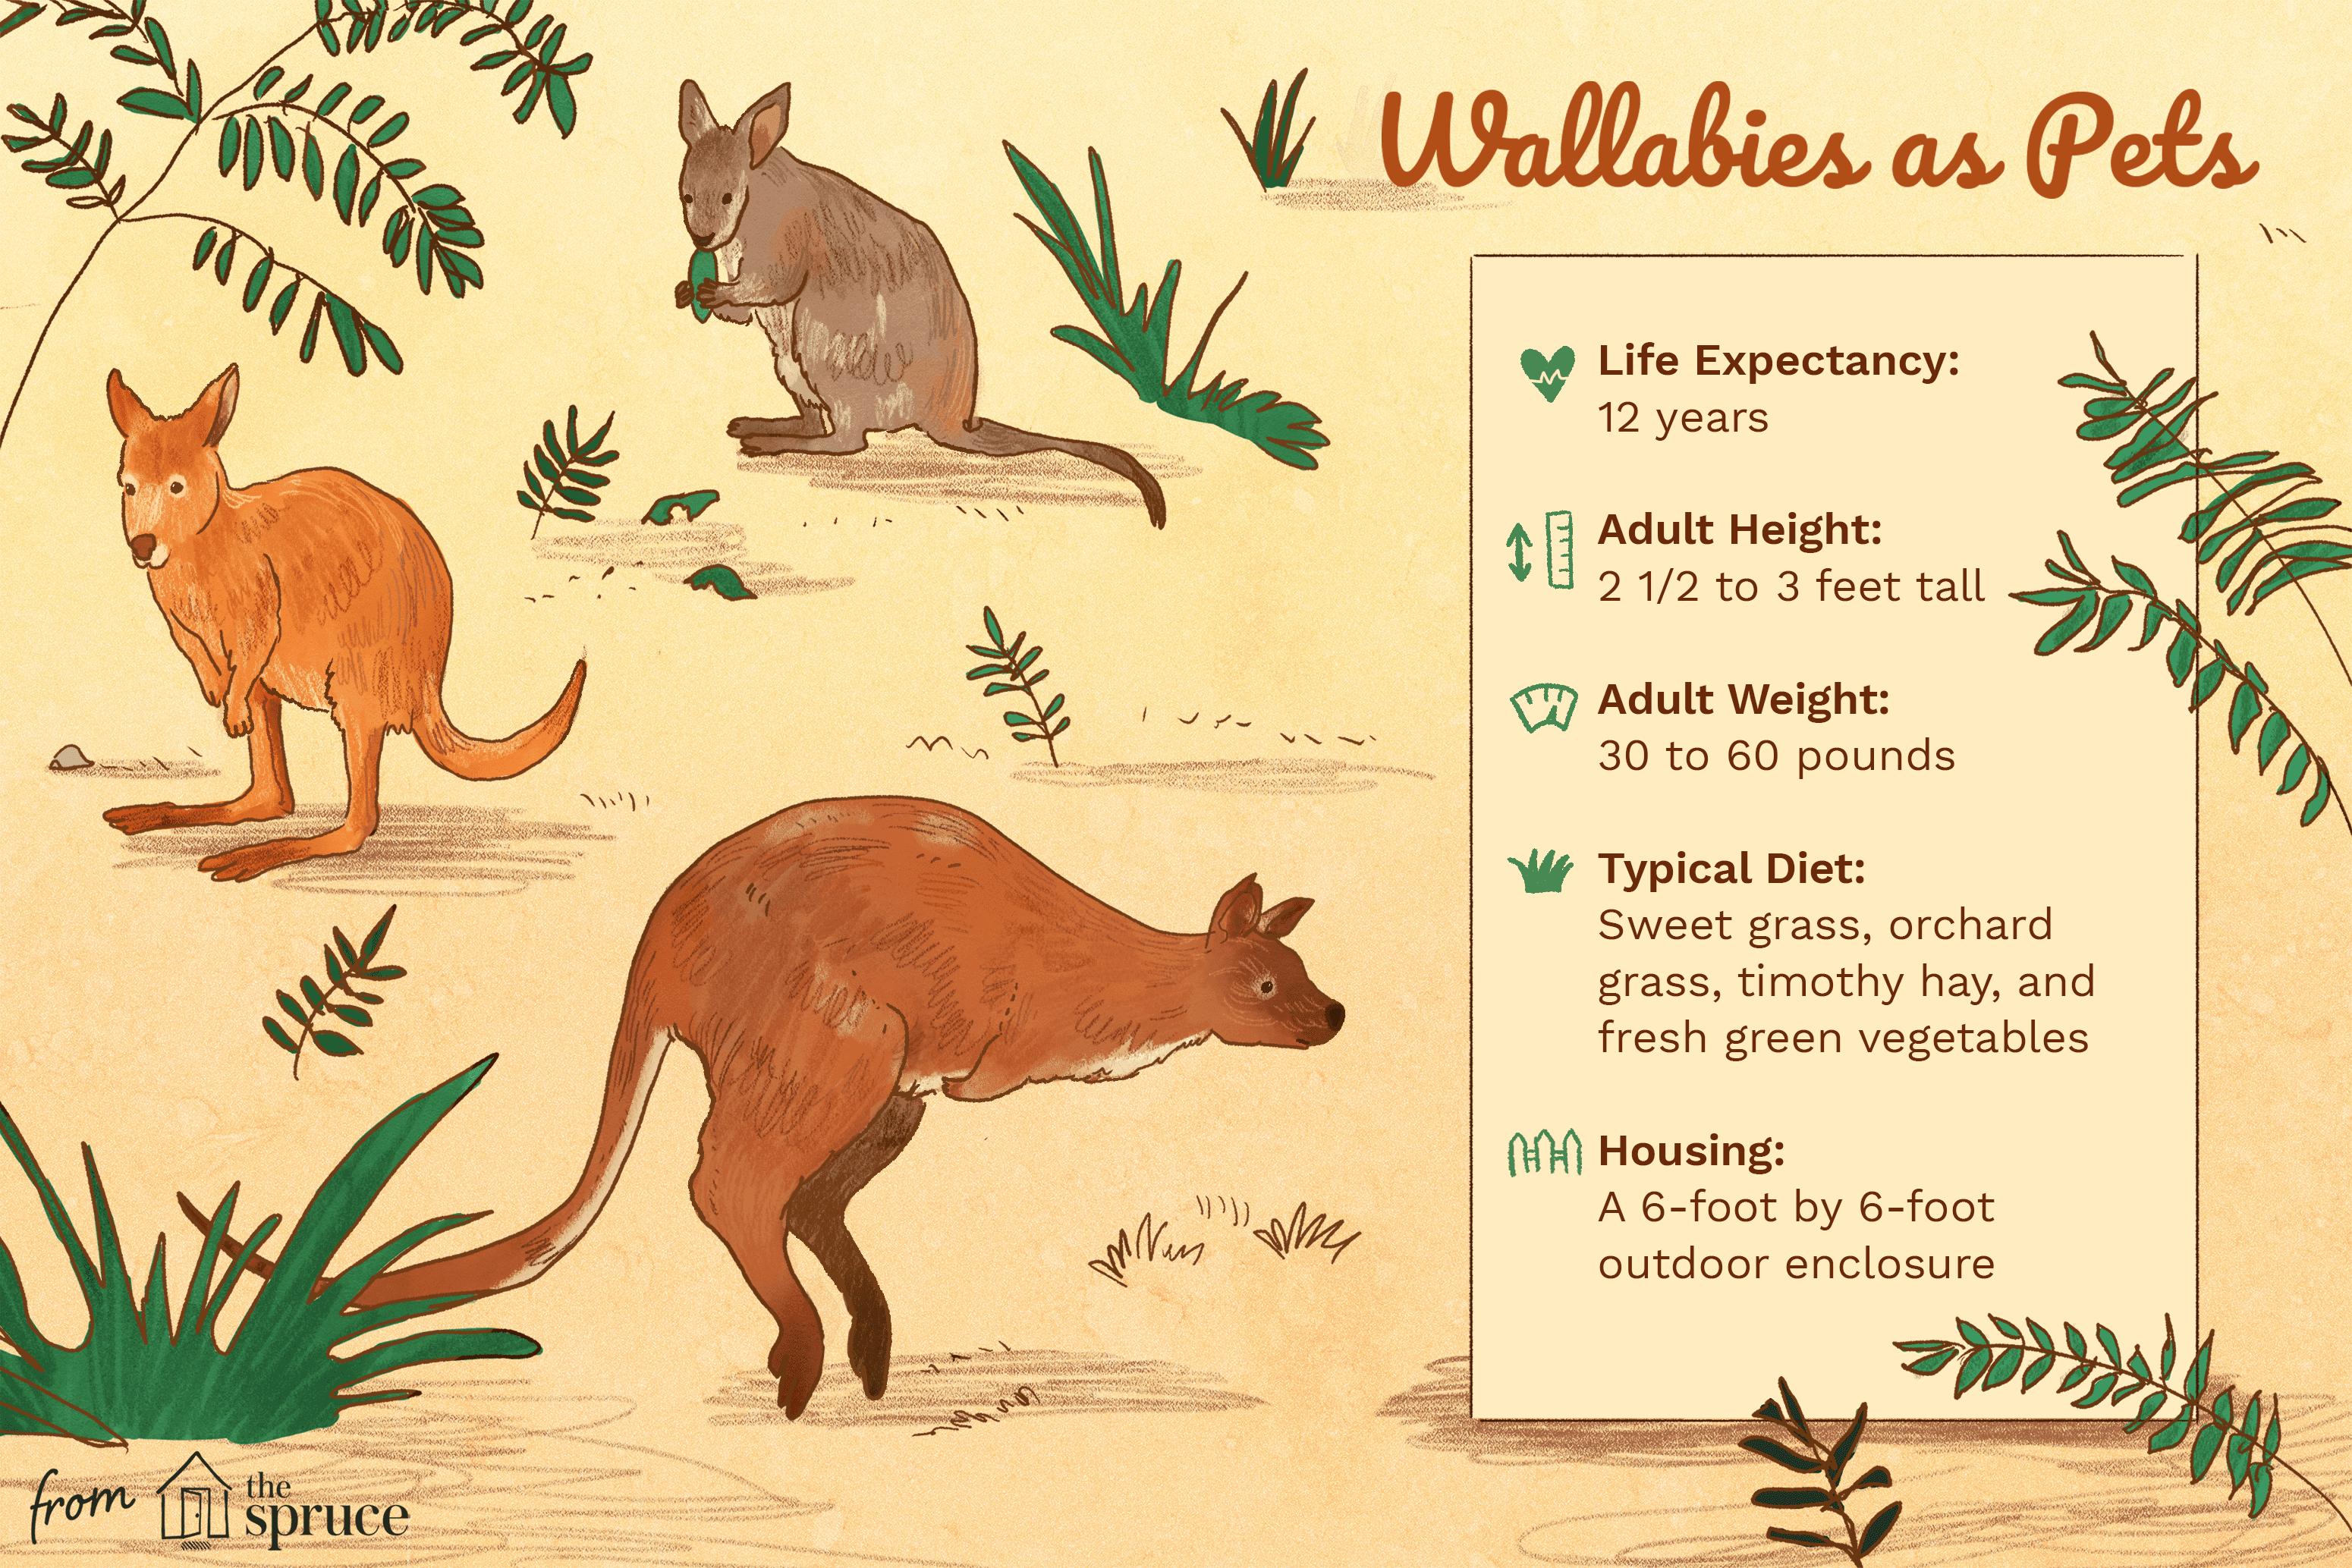 wallabies as pets